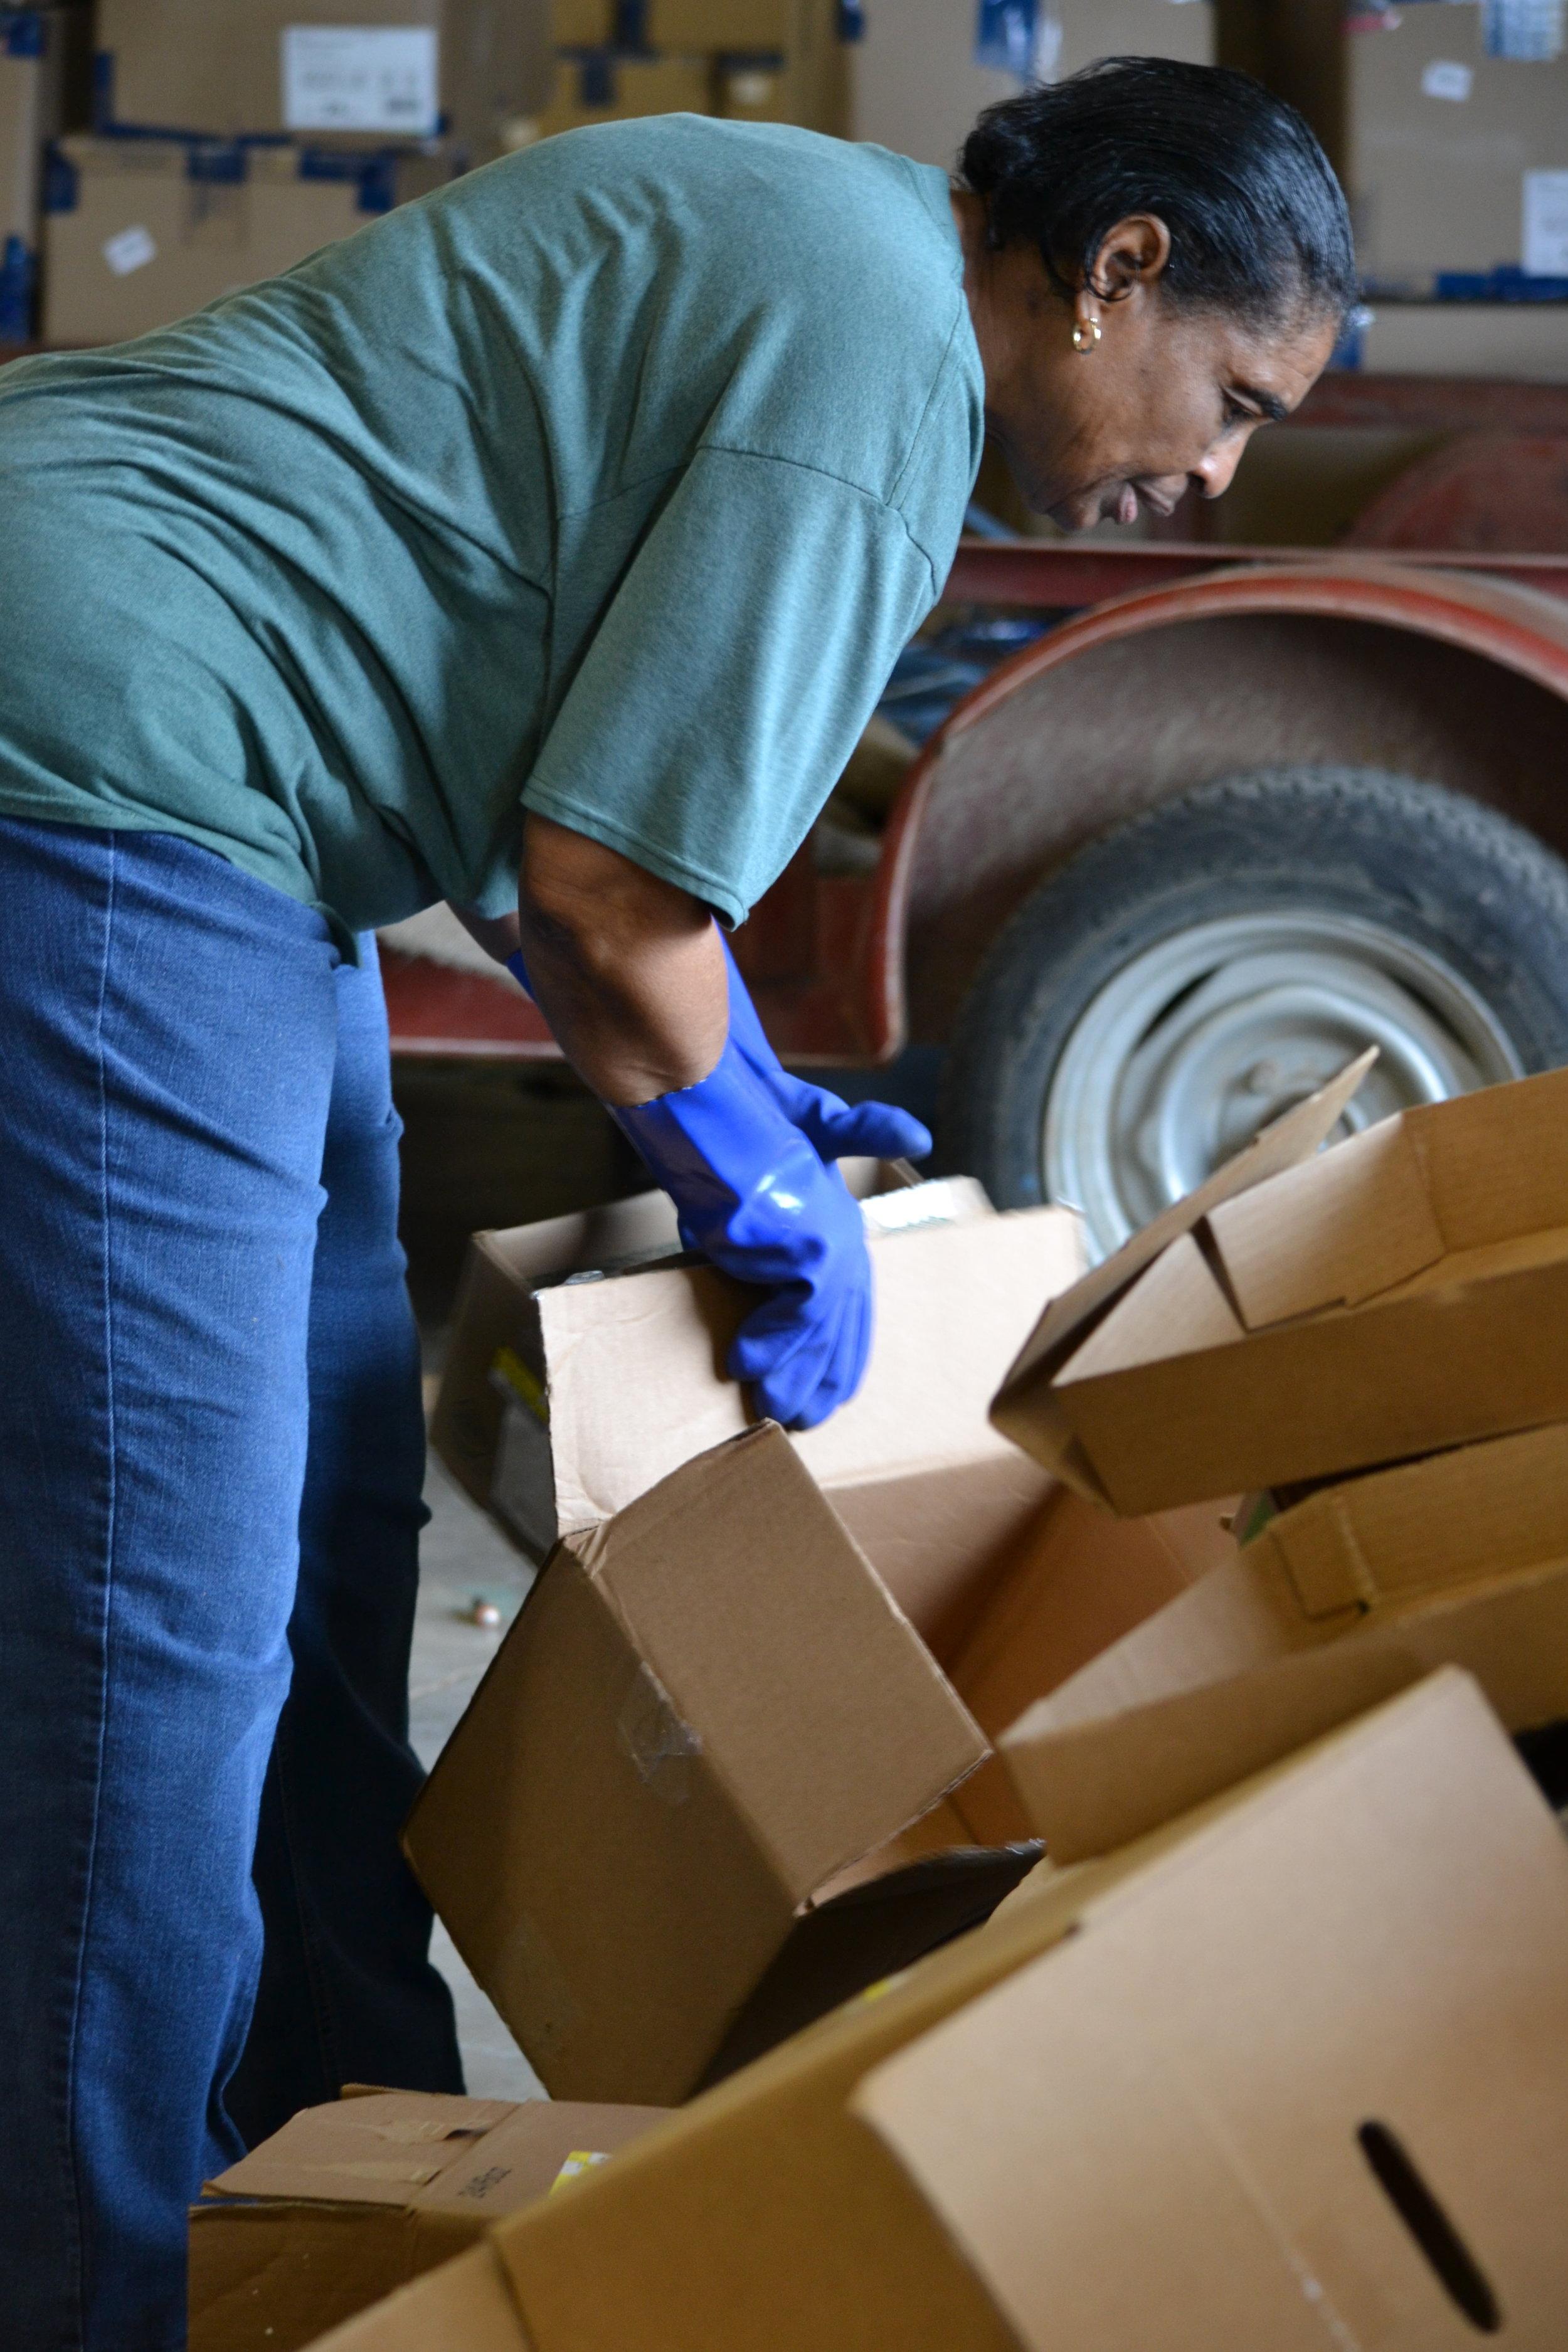 Rita unloading boxes